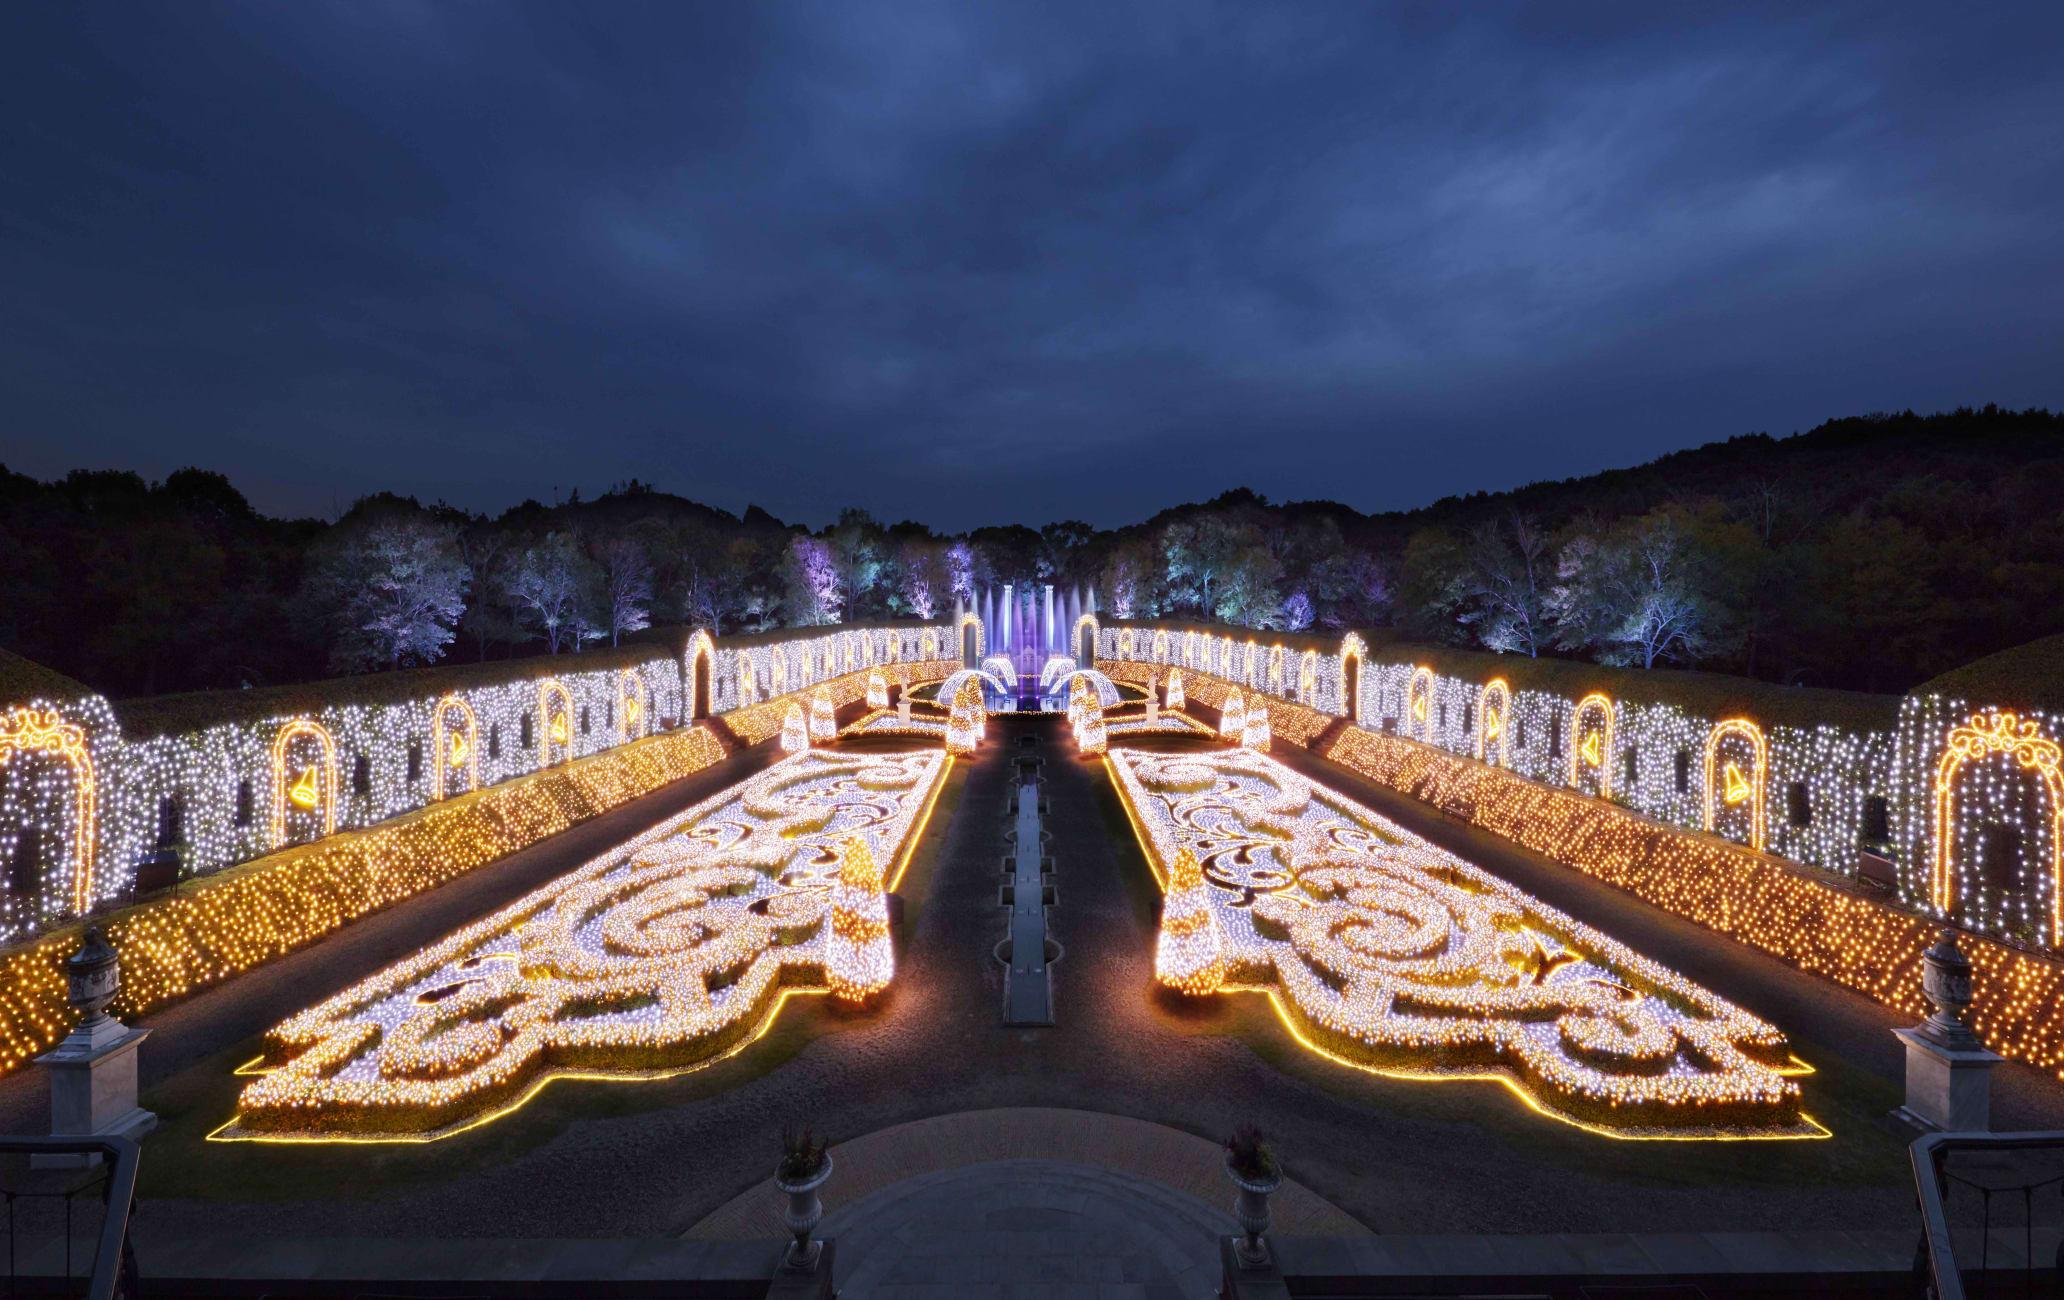 Huis Ten Bosch The Kingdom of Lights